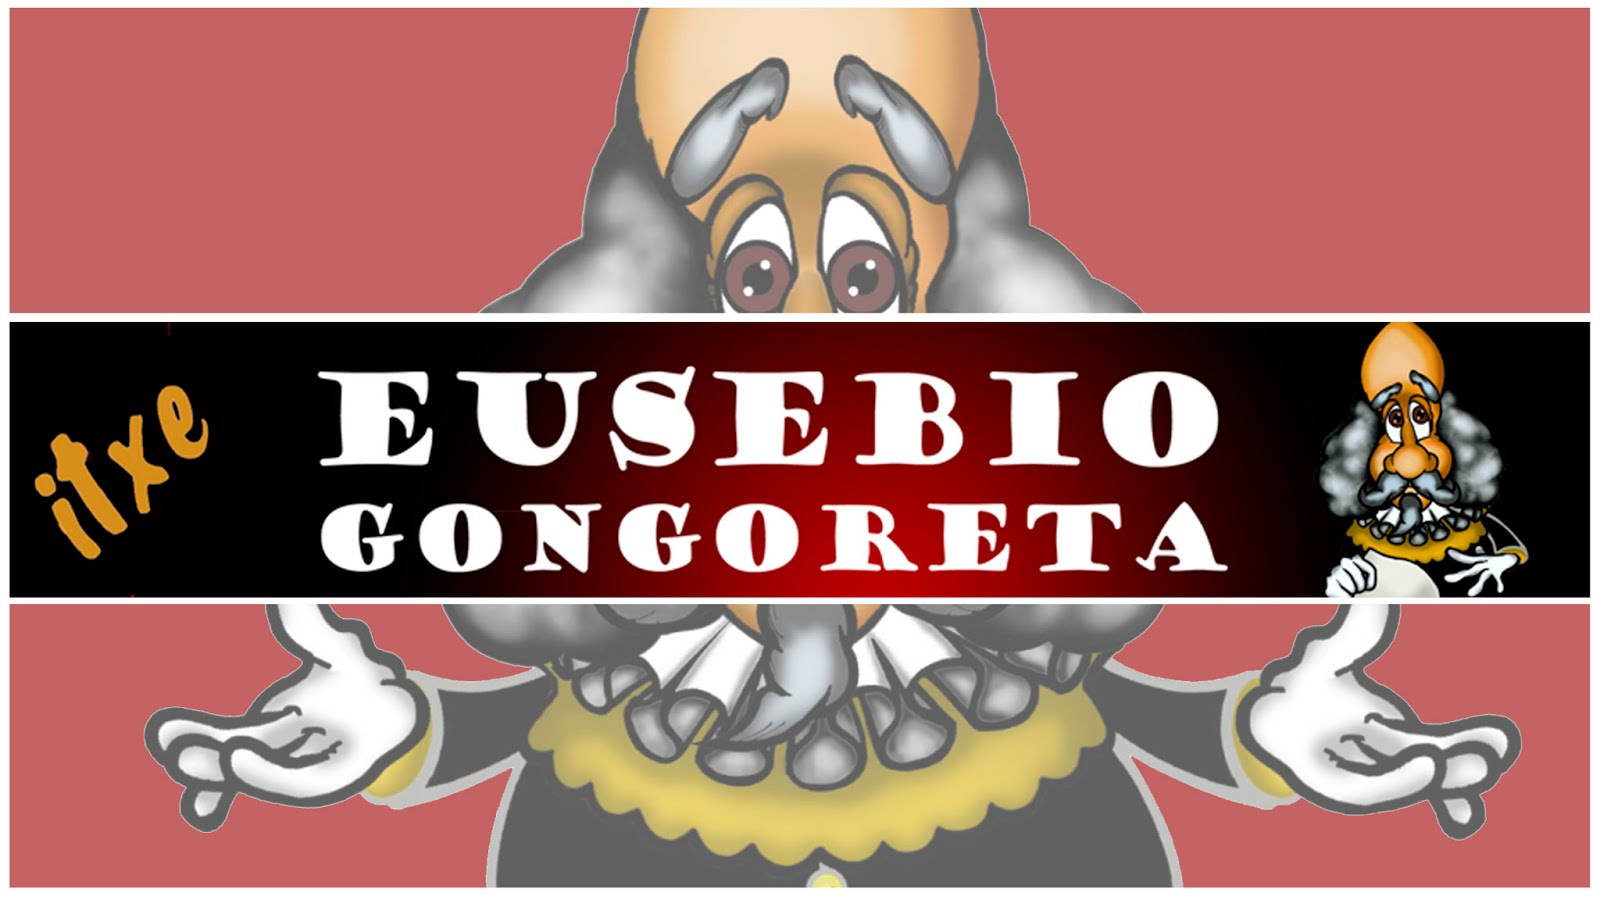 Eusebio Gongoreta